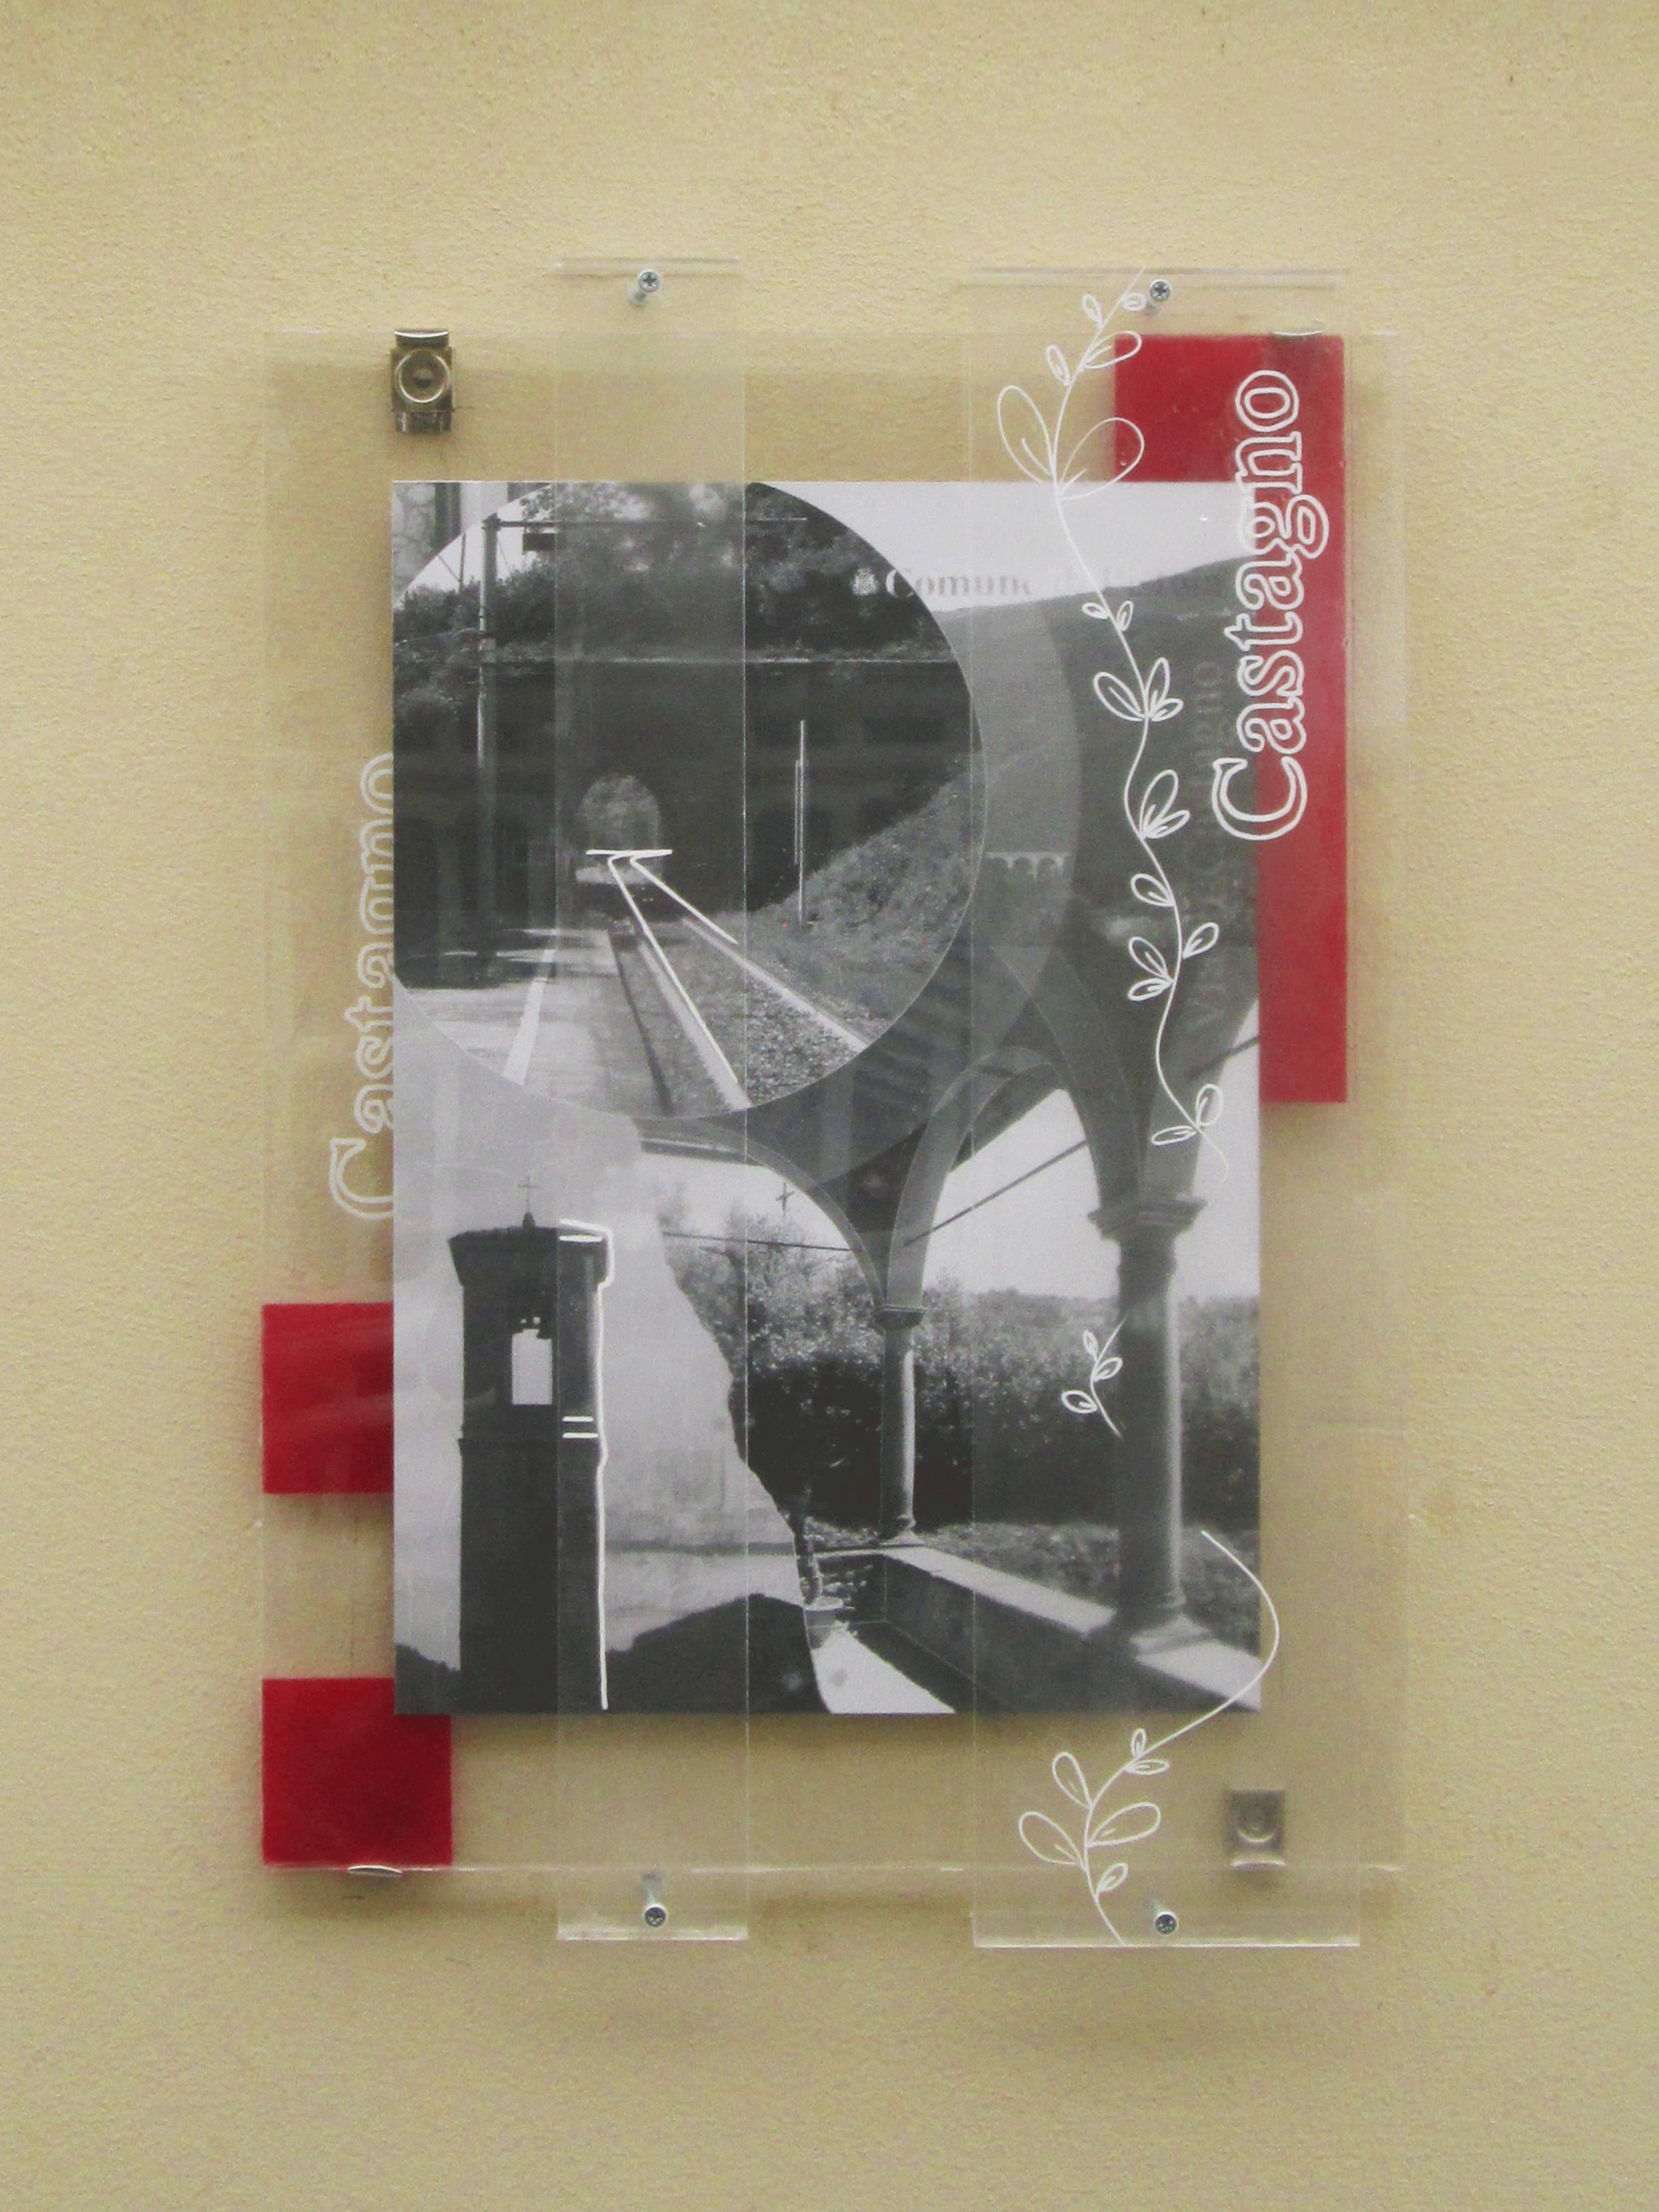 Castagno-_-Final-Collage-Artwork-by-Marija-Stankovic.png